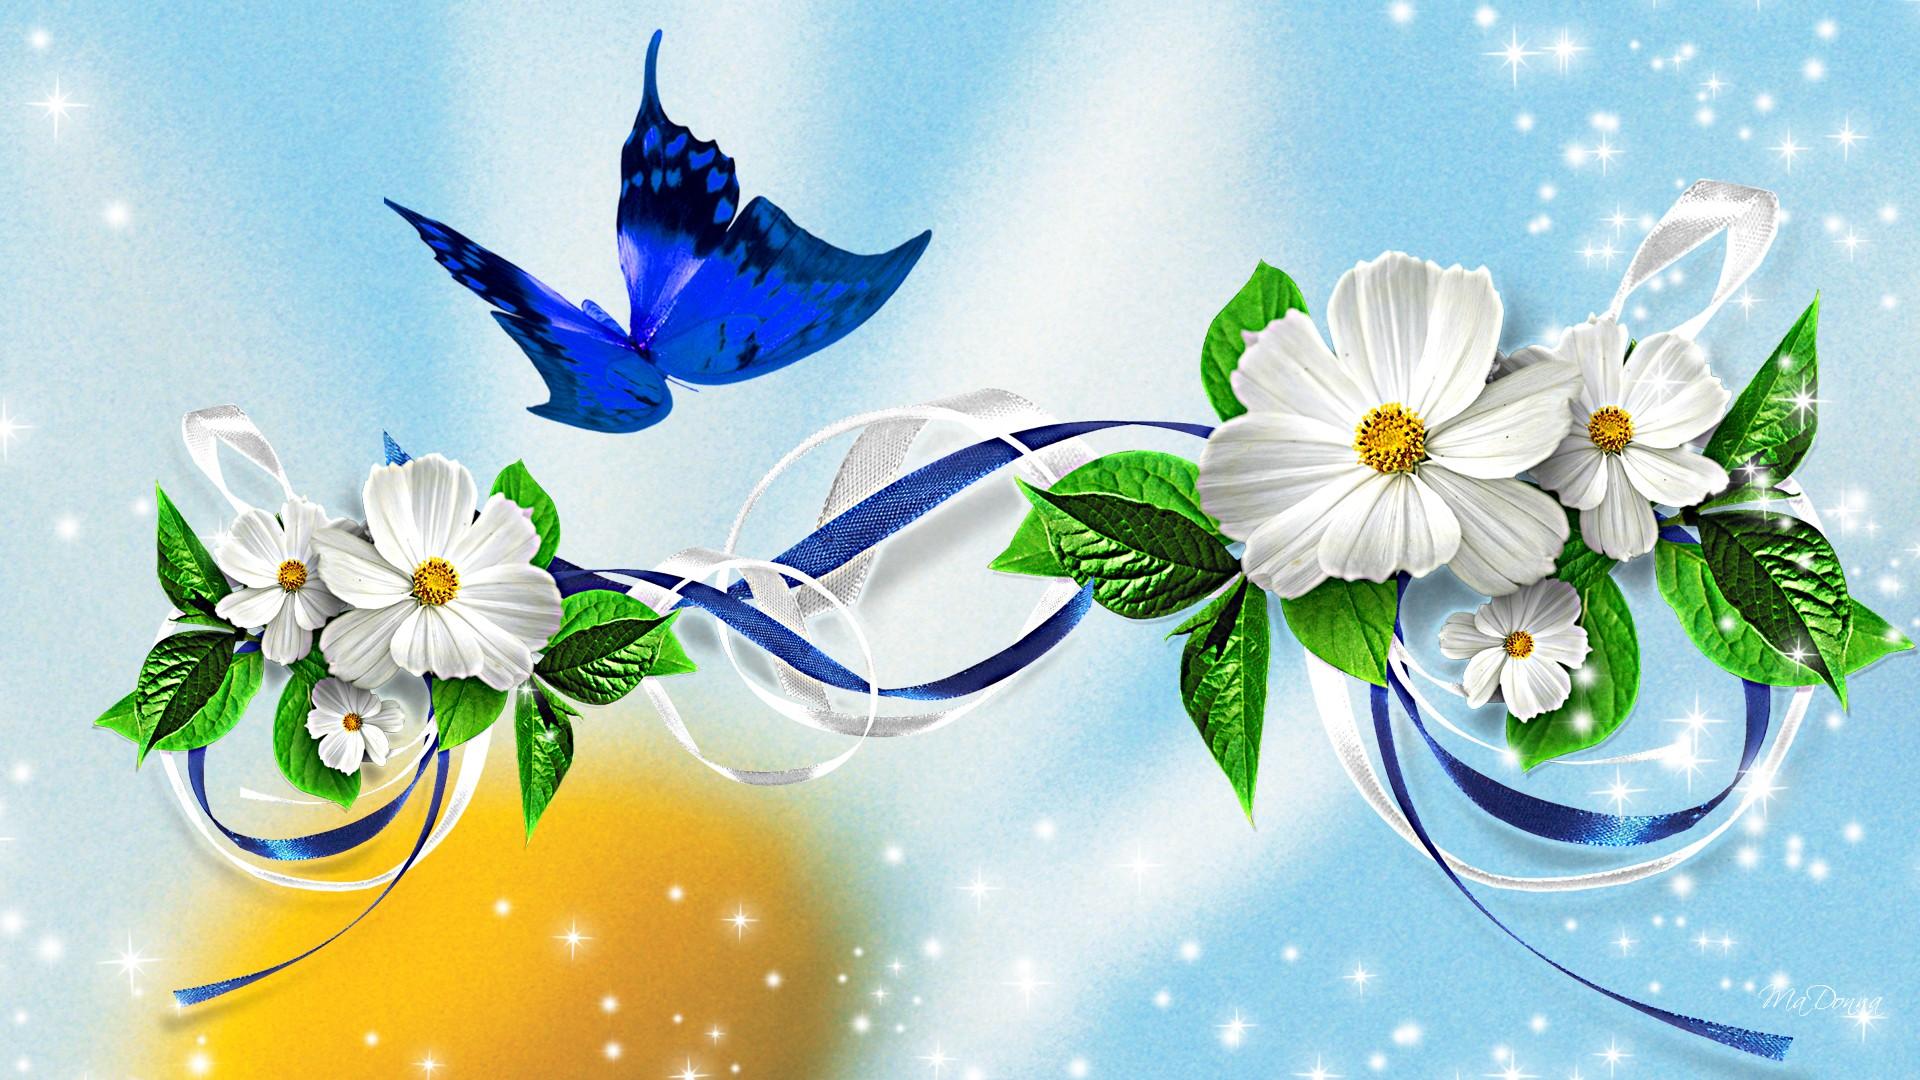 flower wallpaper images